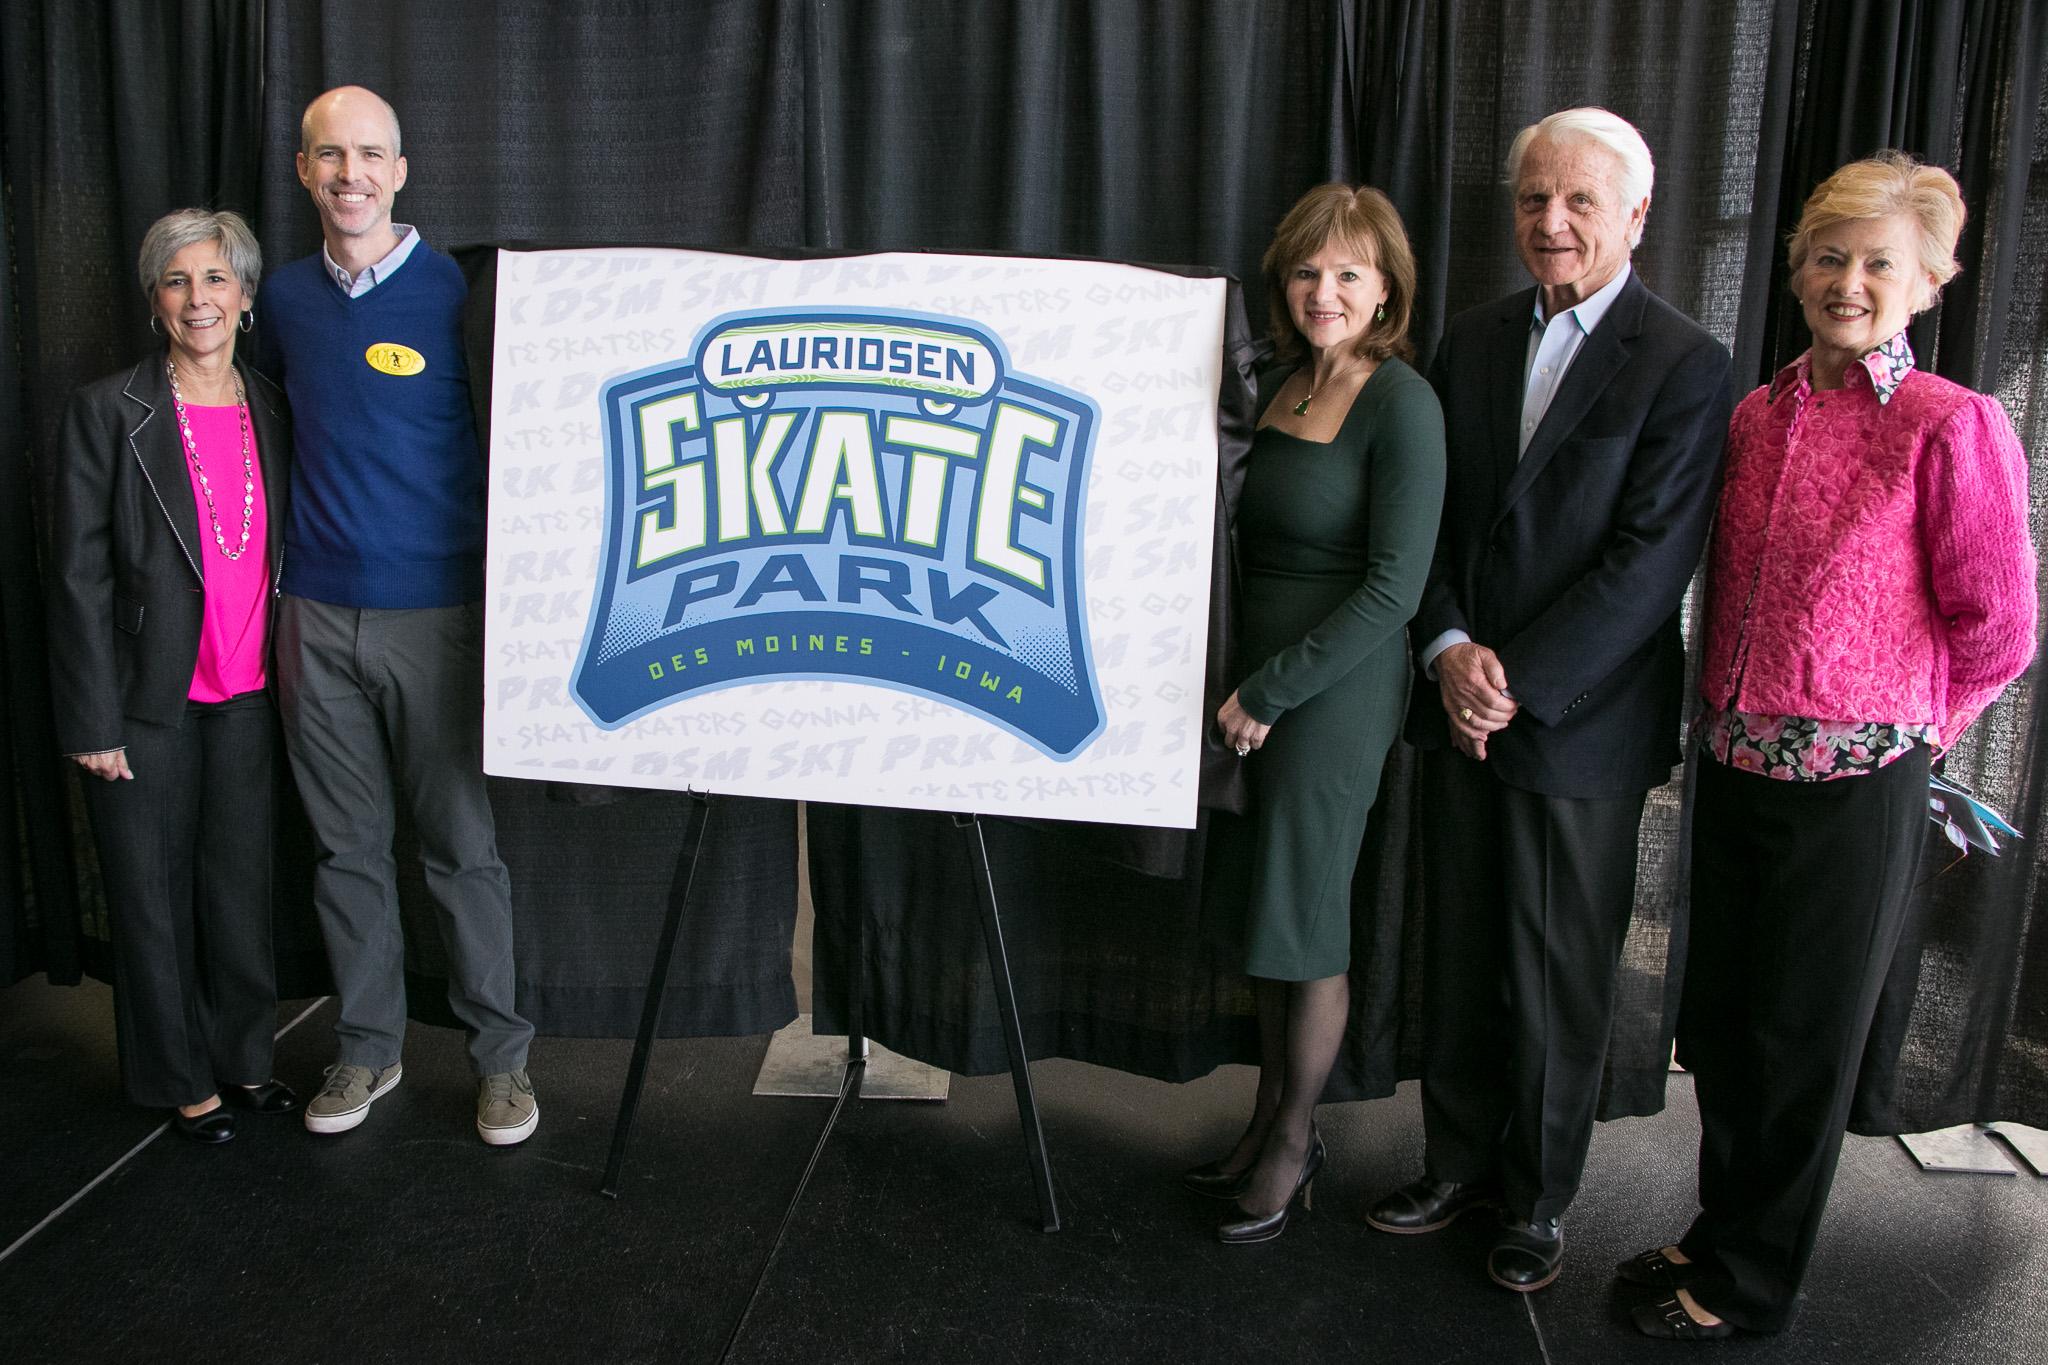 Lauridsens' $1M donation lifts skate park campaign